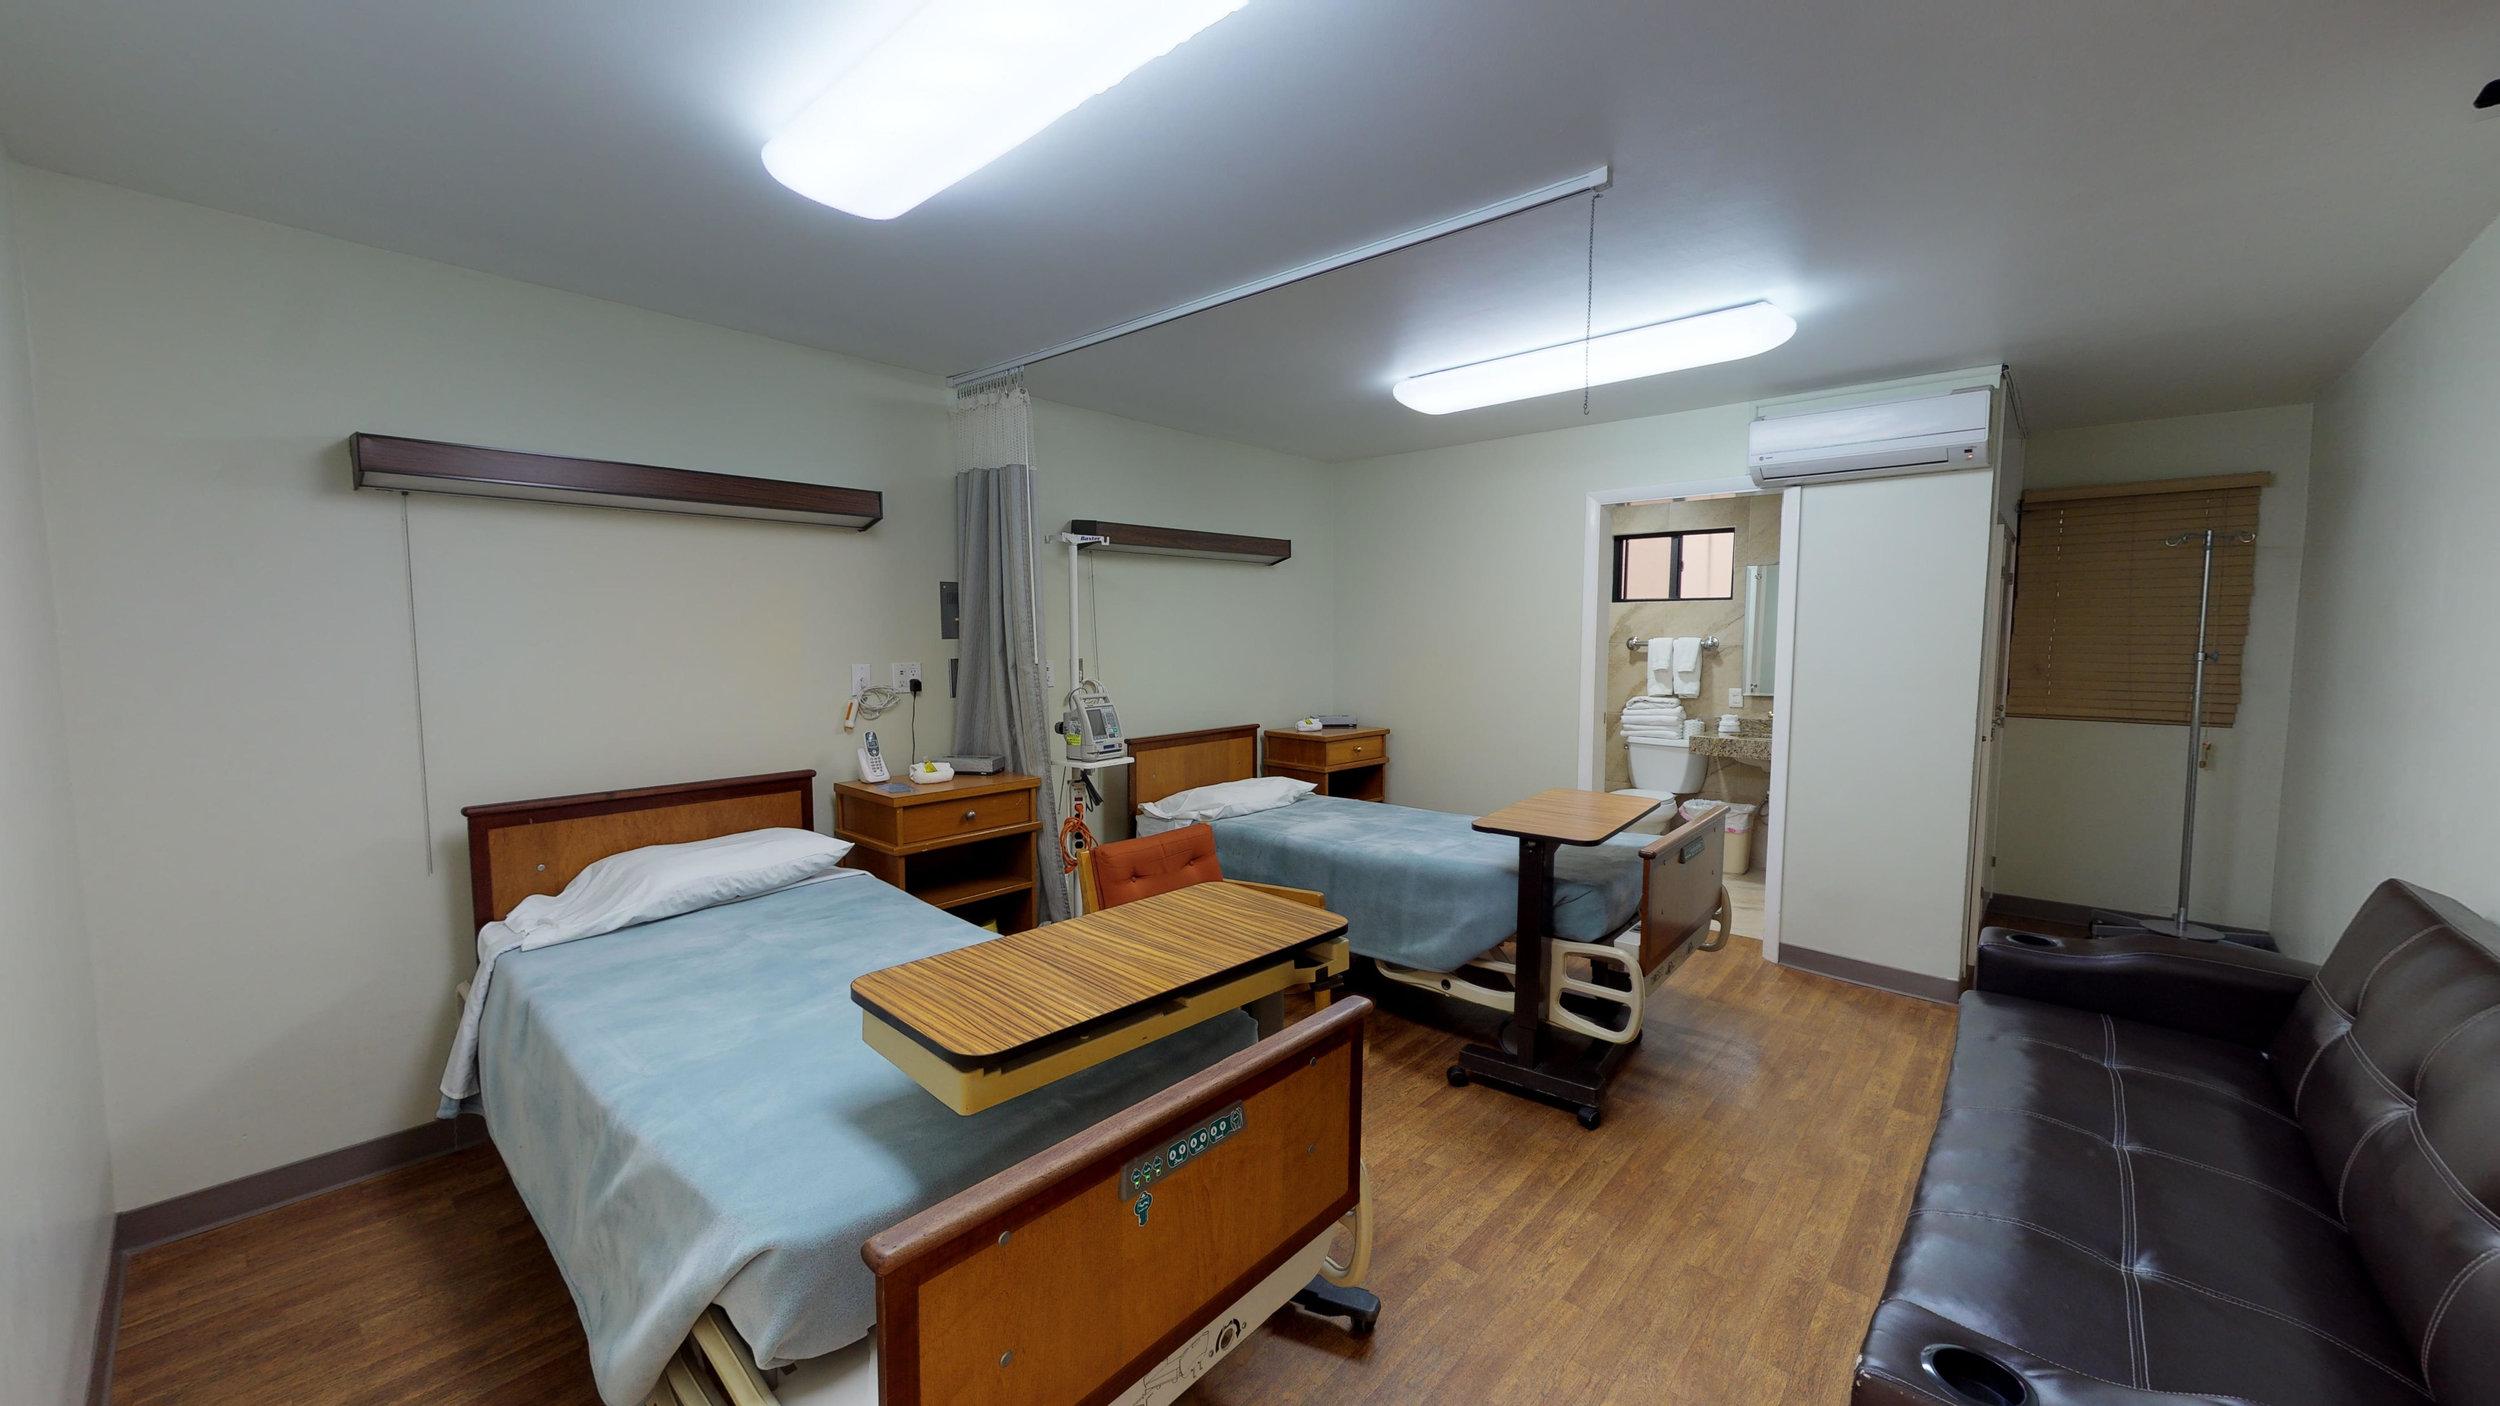 International-Bio-Care-Hospital-05082019_134212.jpg